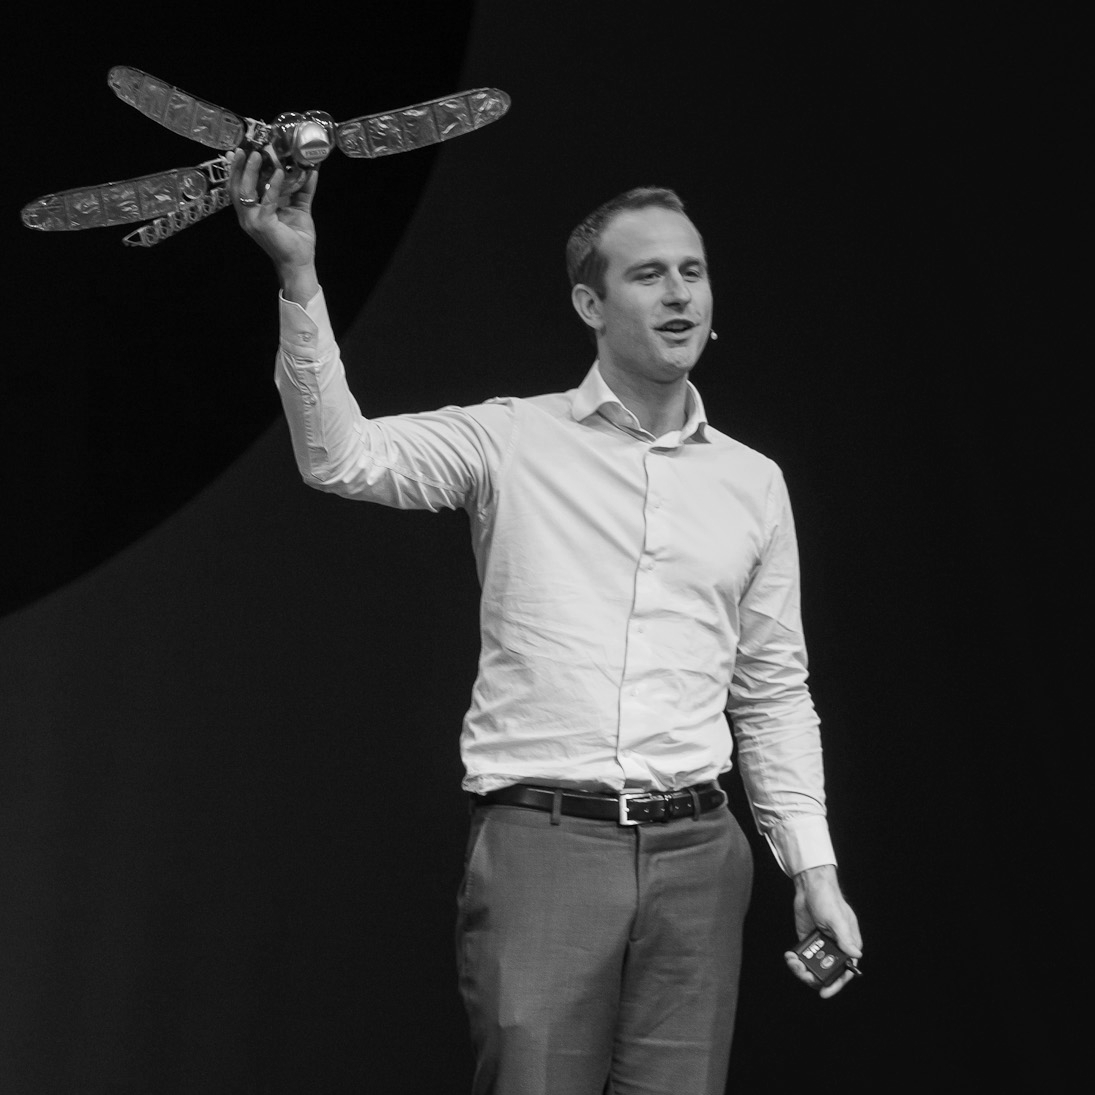 Elias Knubben - When nature teaches, we learn through playing